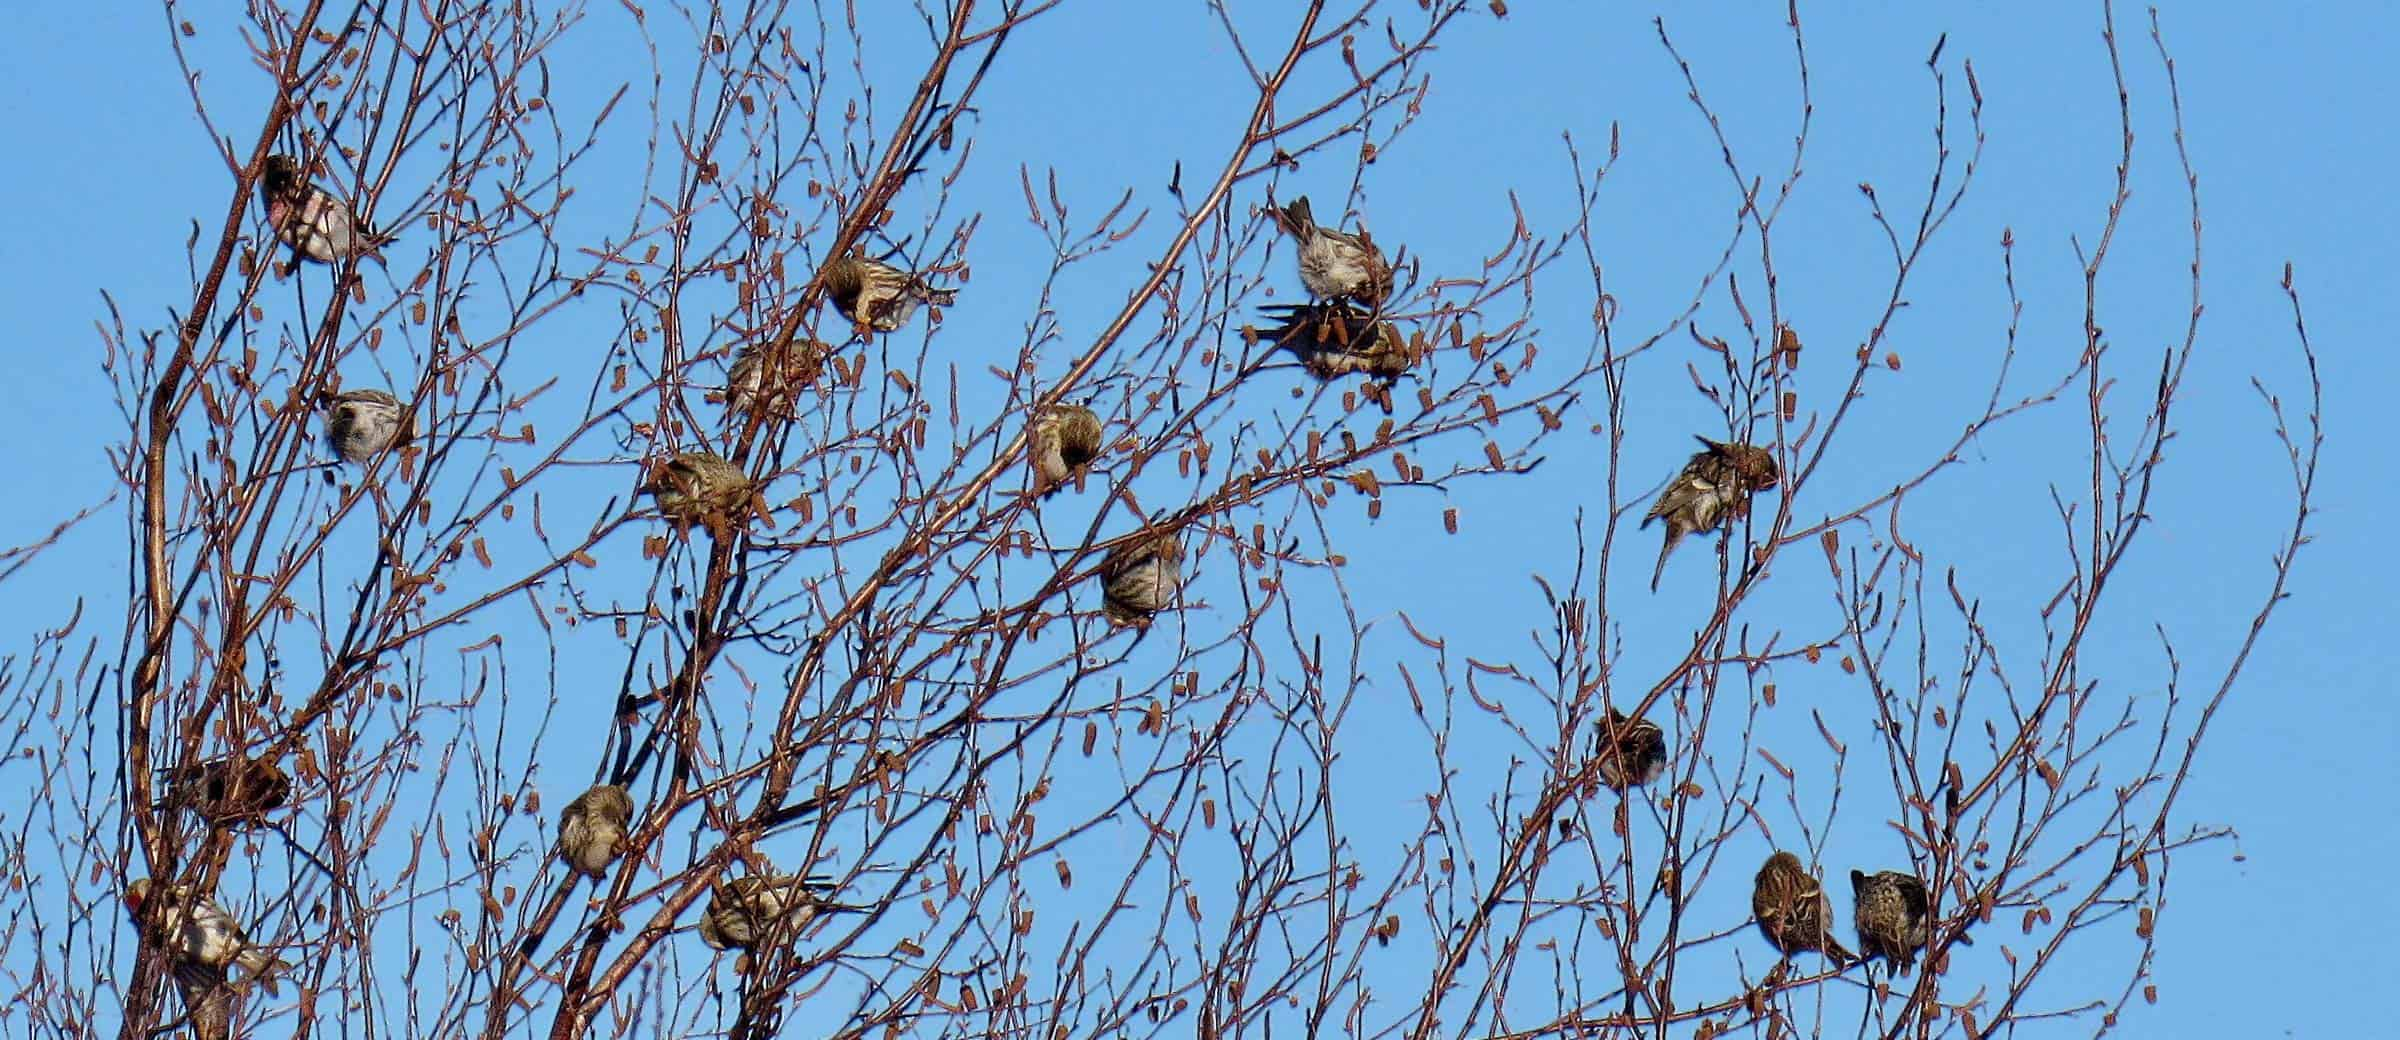 Common redpolls. Photo by Kristen Lindquist.